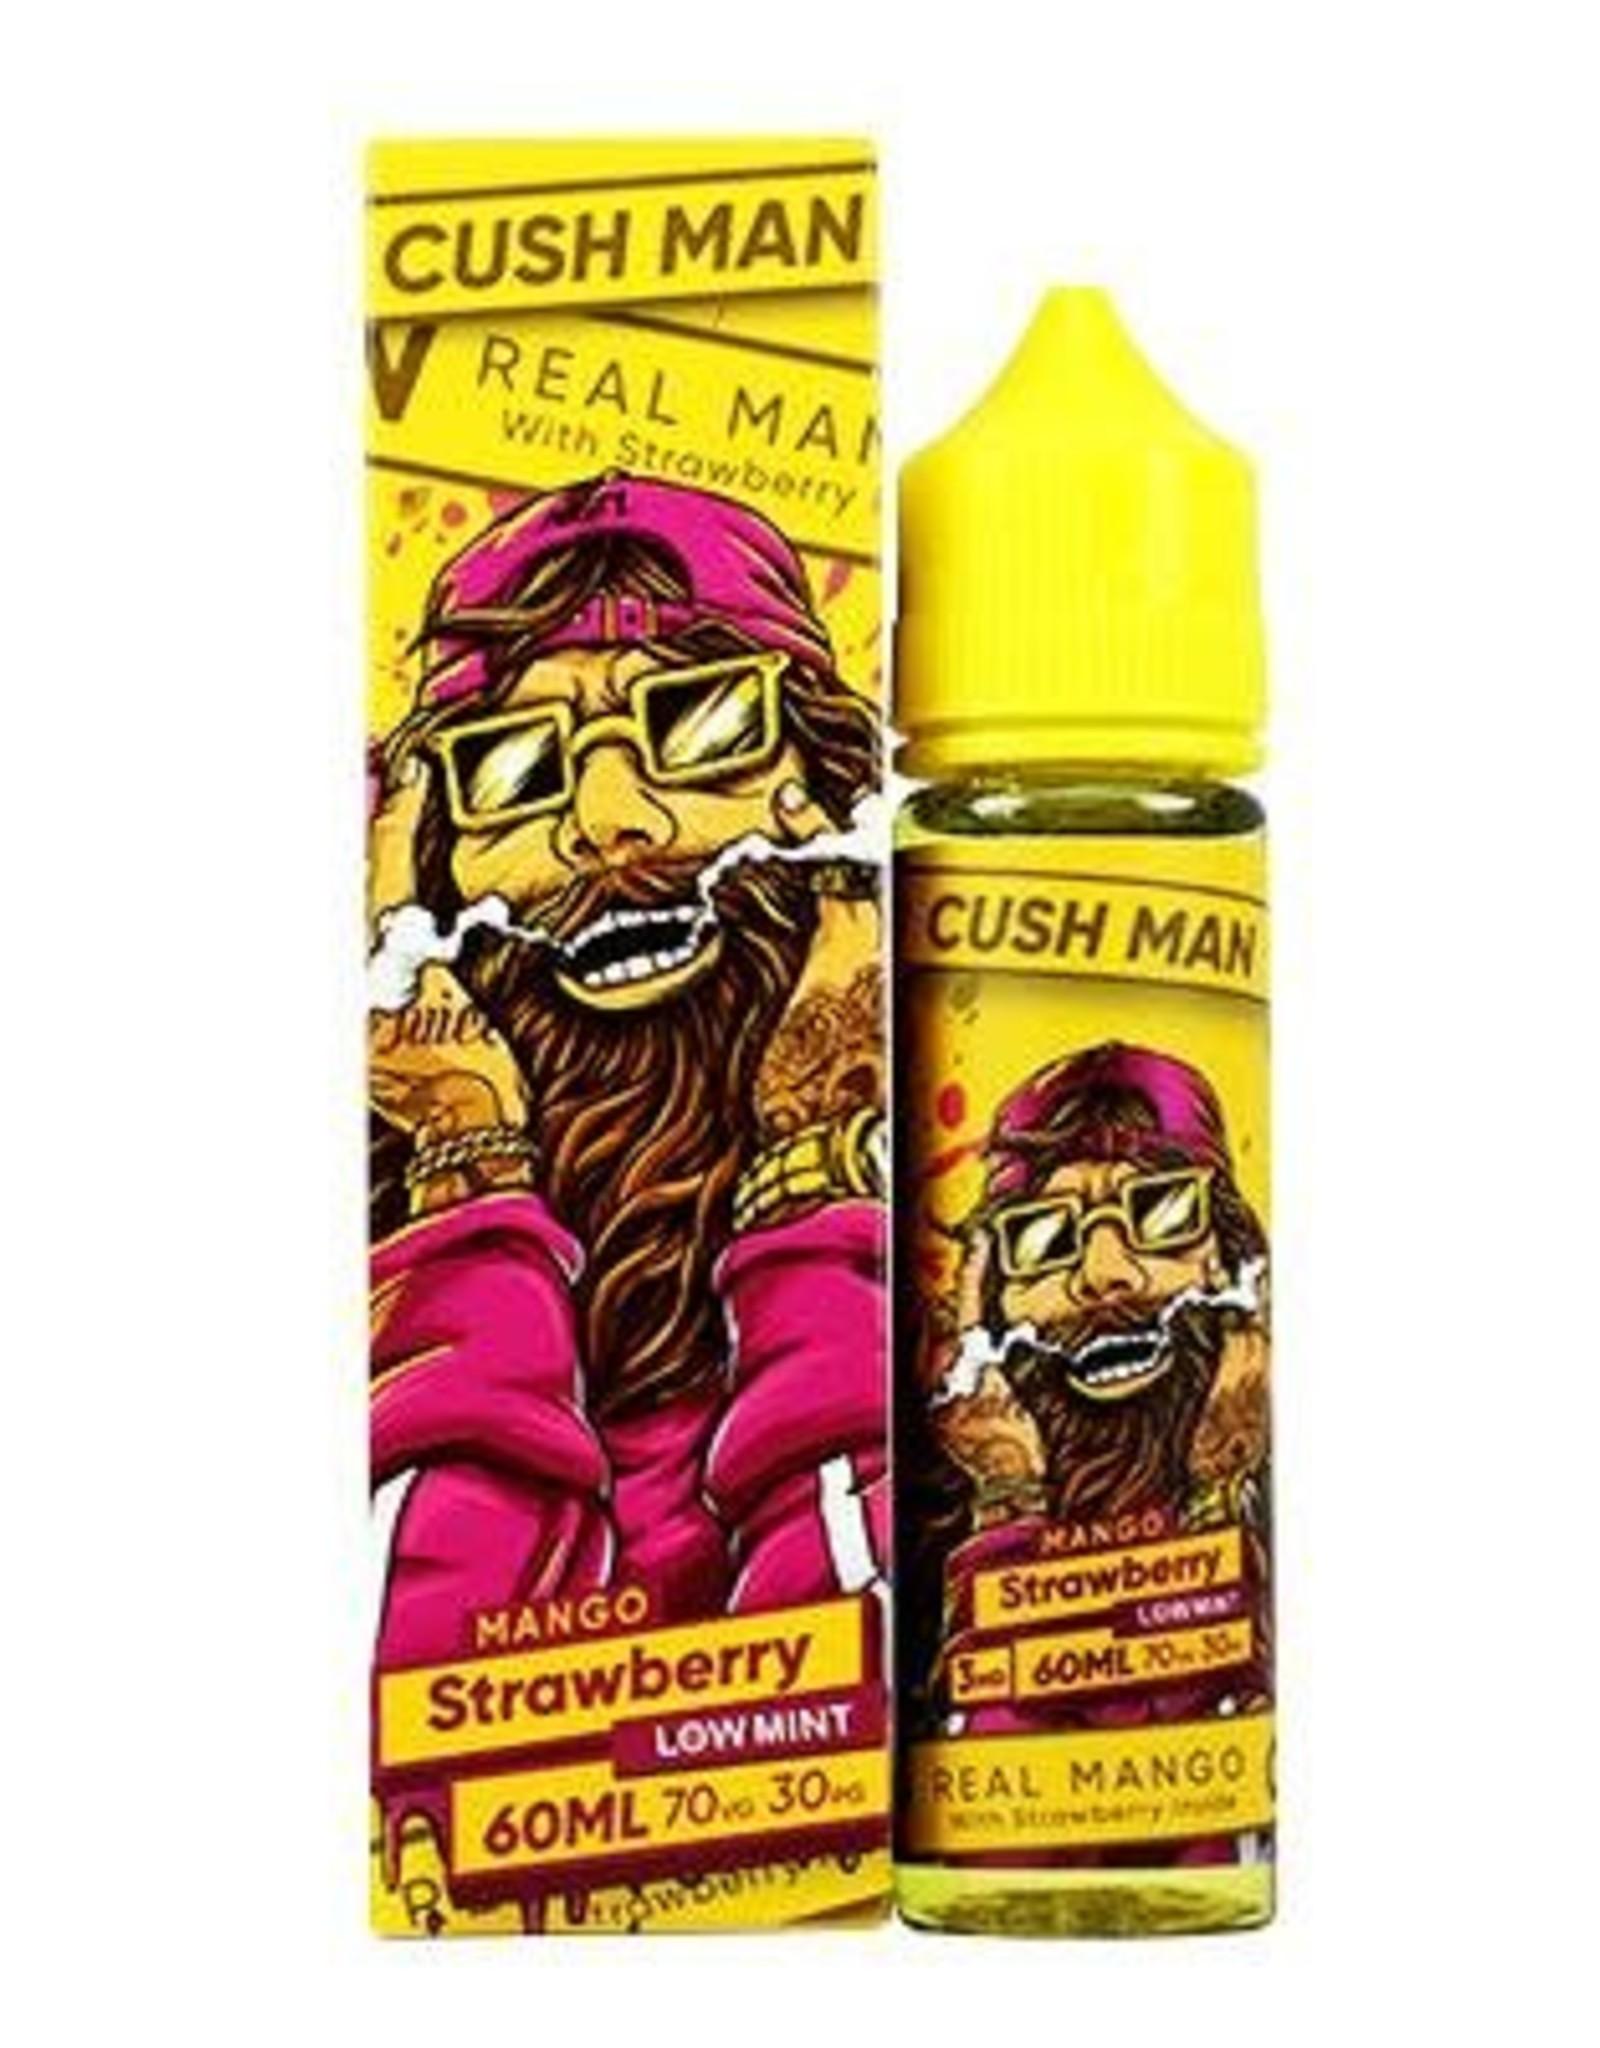 Nasty Juice - Cush Man Mango Strawberry (Low Mint) (60mL)